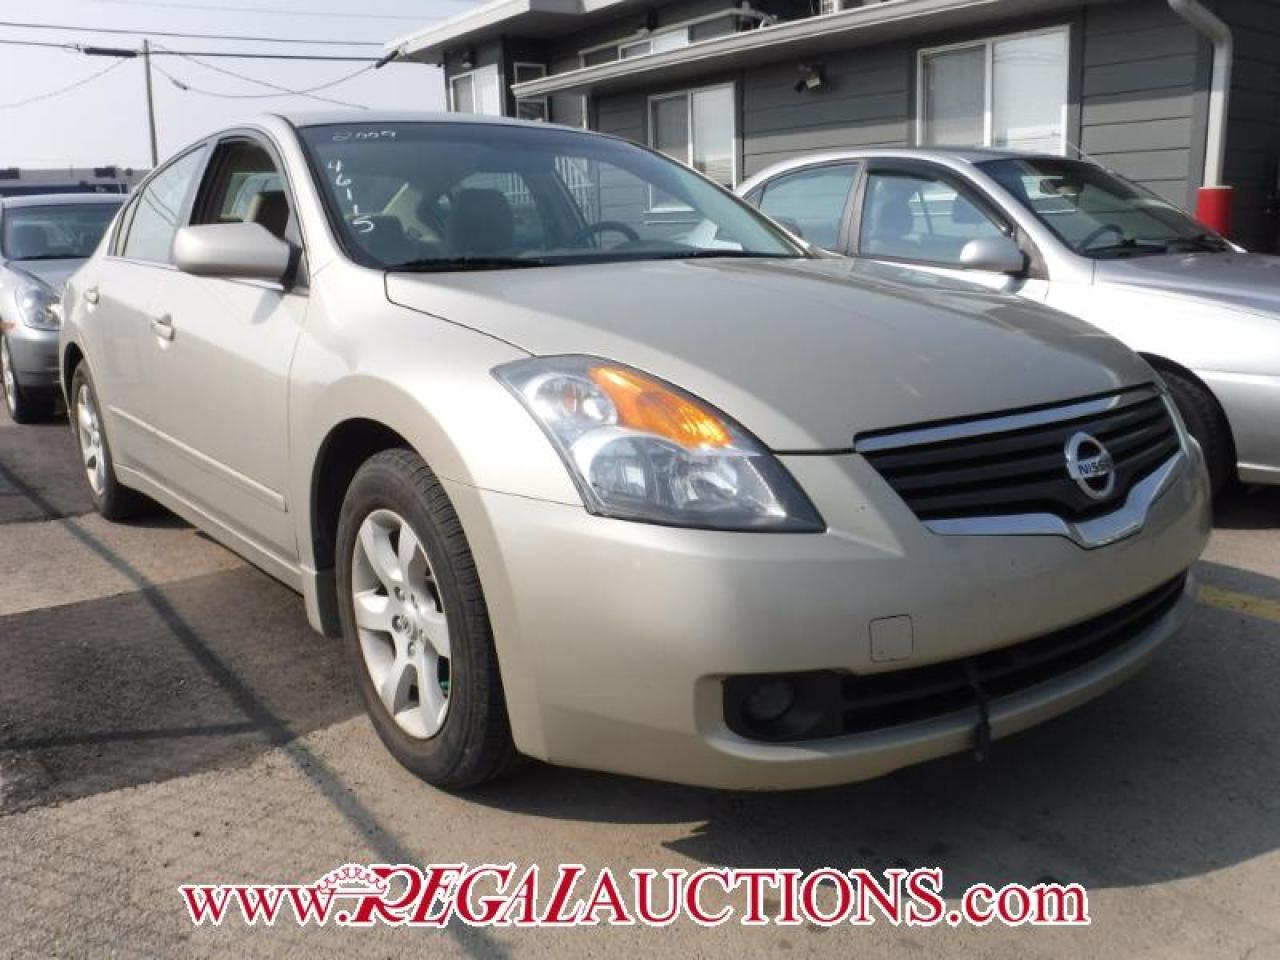 2009 Nissan Altima S 4D Sedan